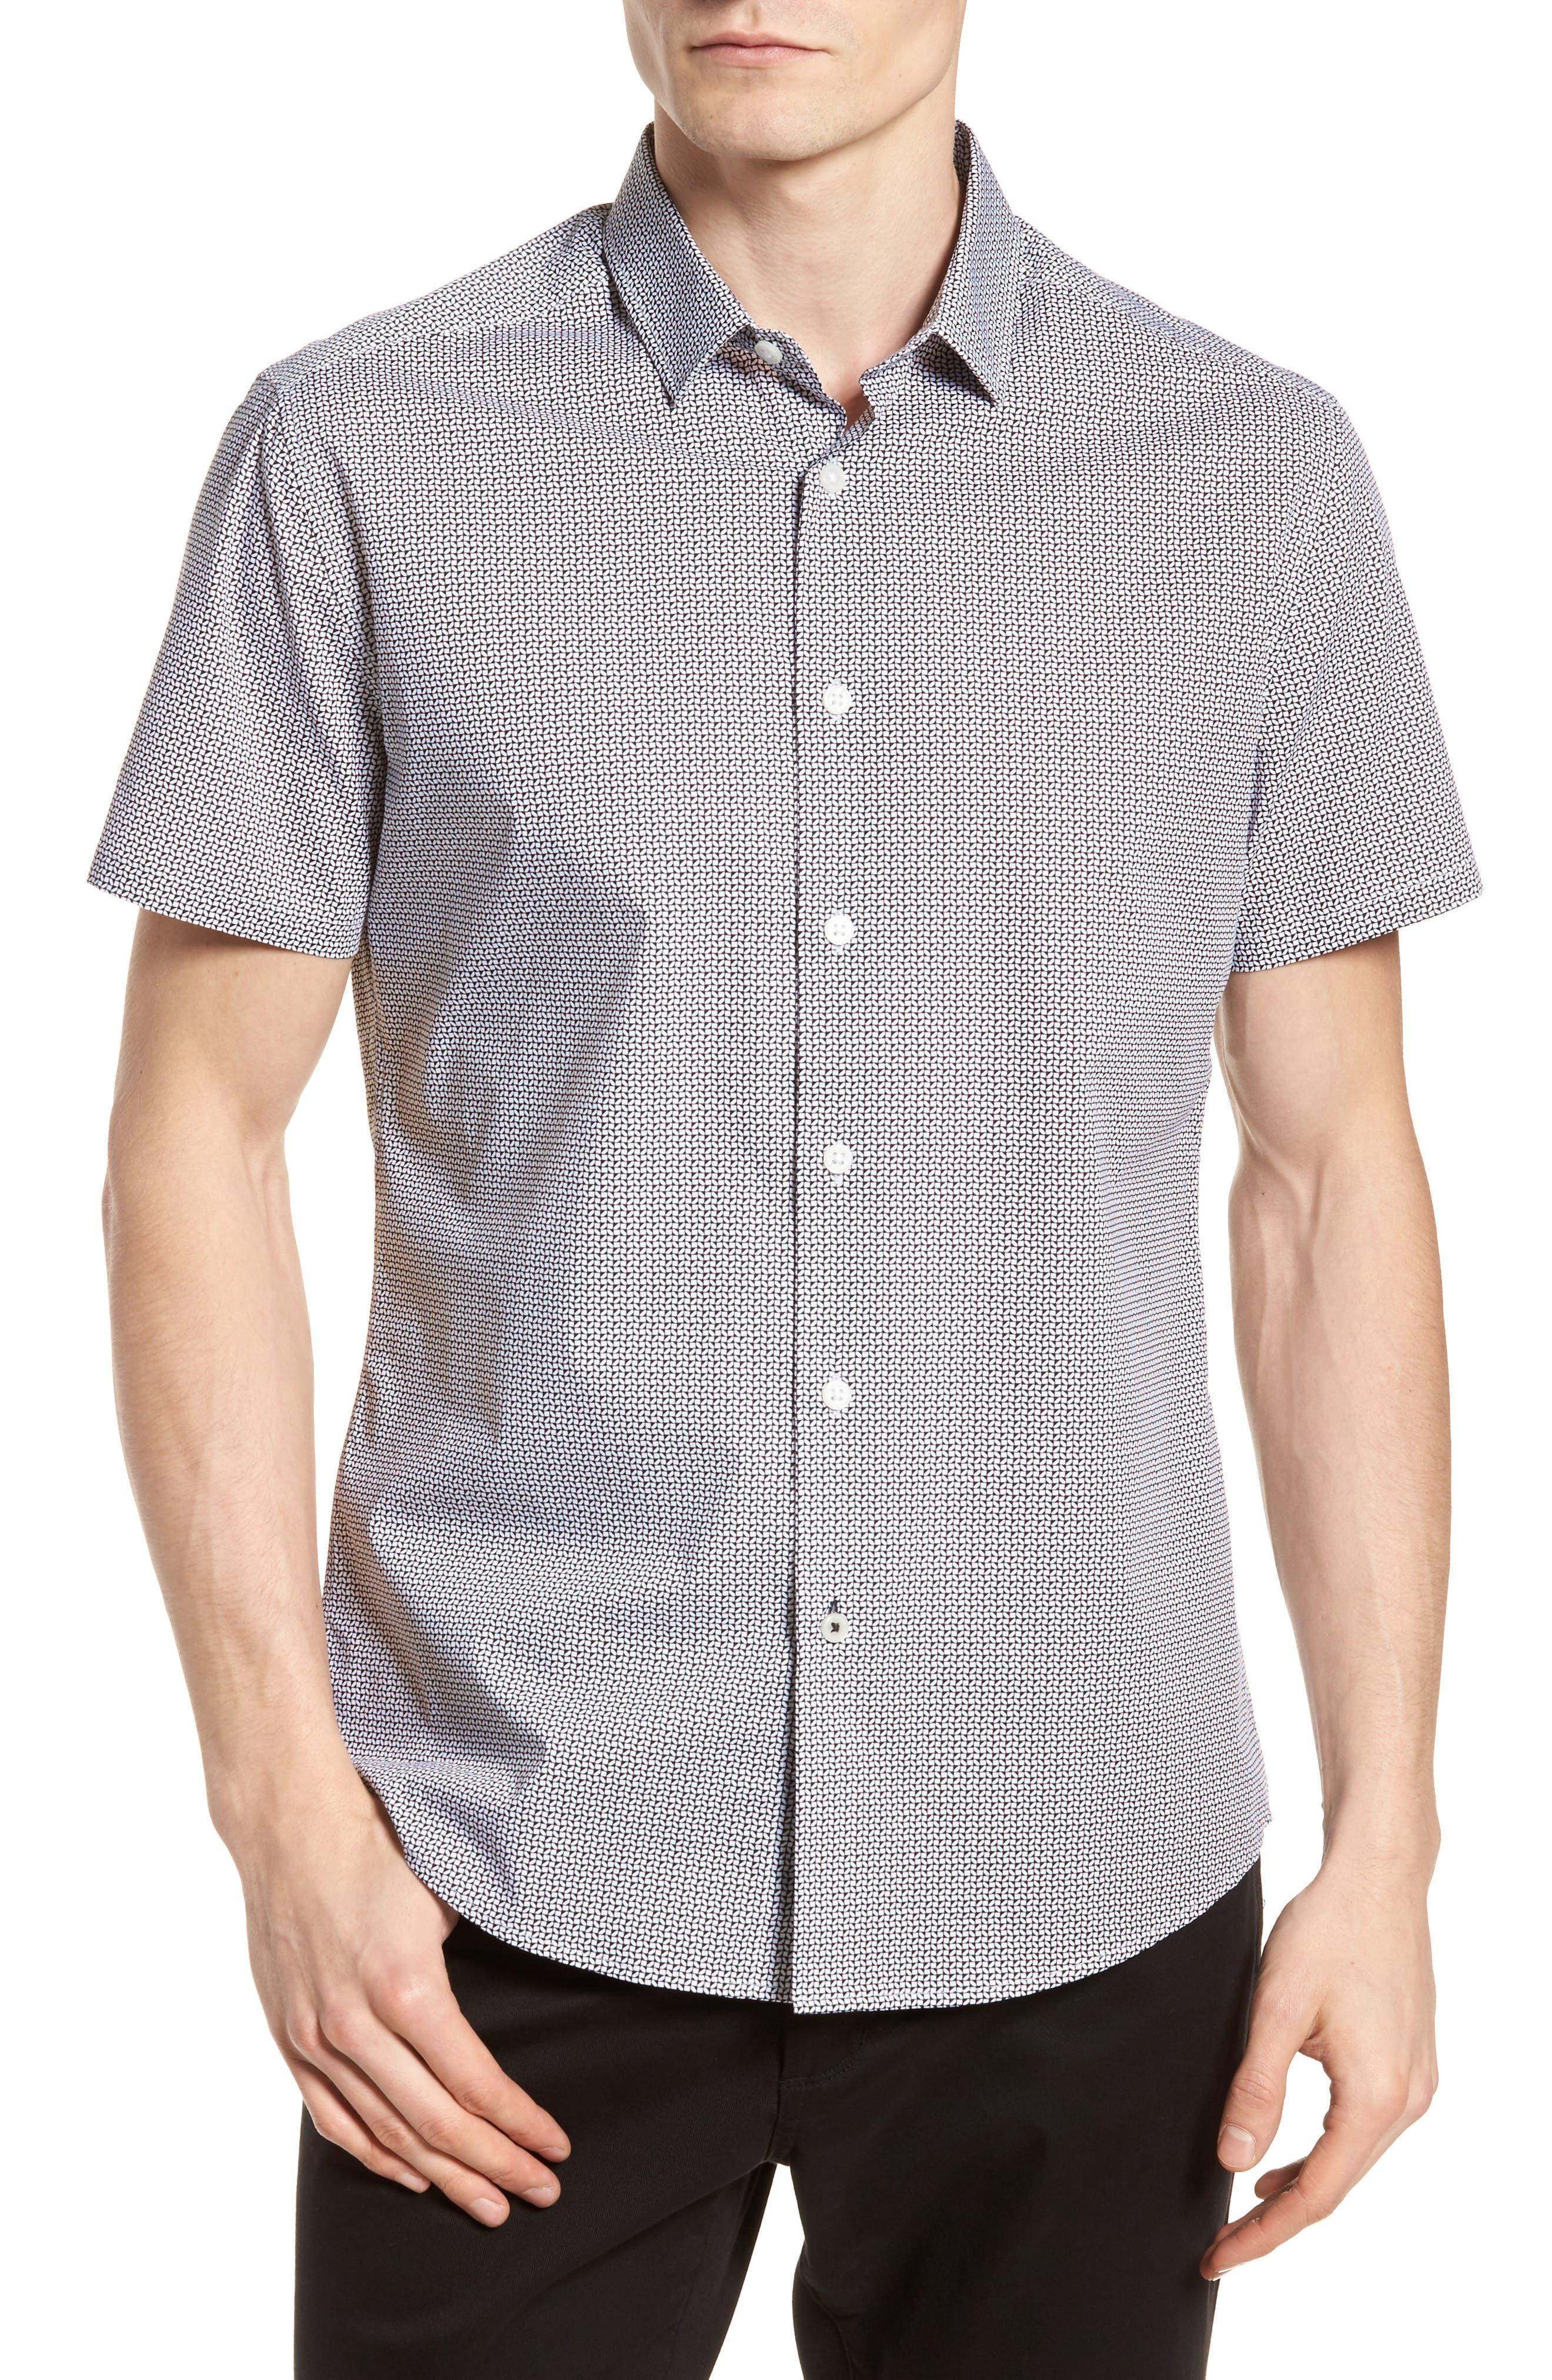 Main Image - Vince Camuto Slim Fit Geo Print Sport Shirt